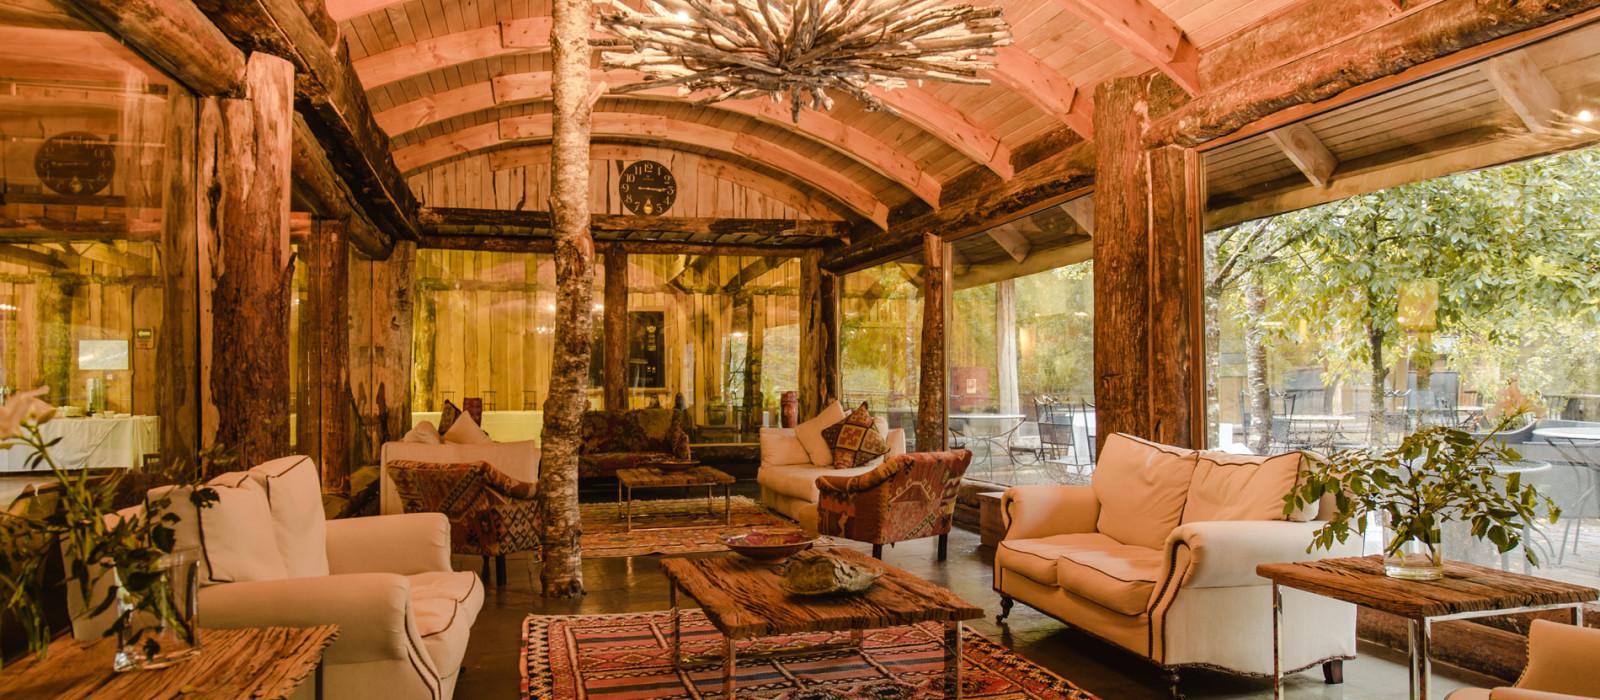 Hotel Nothofagus  & Spa Chile